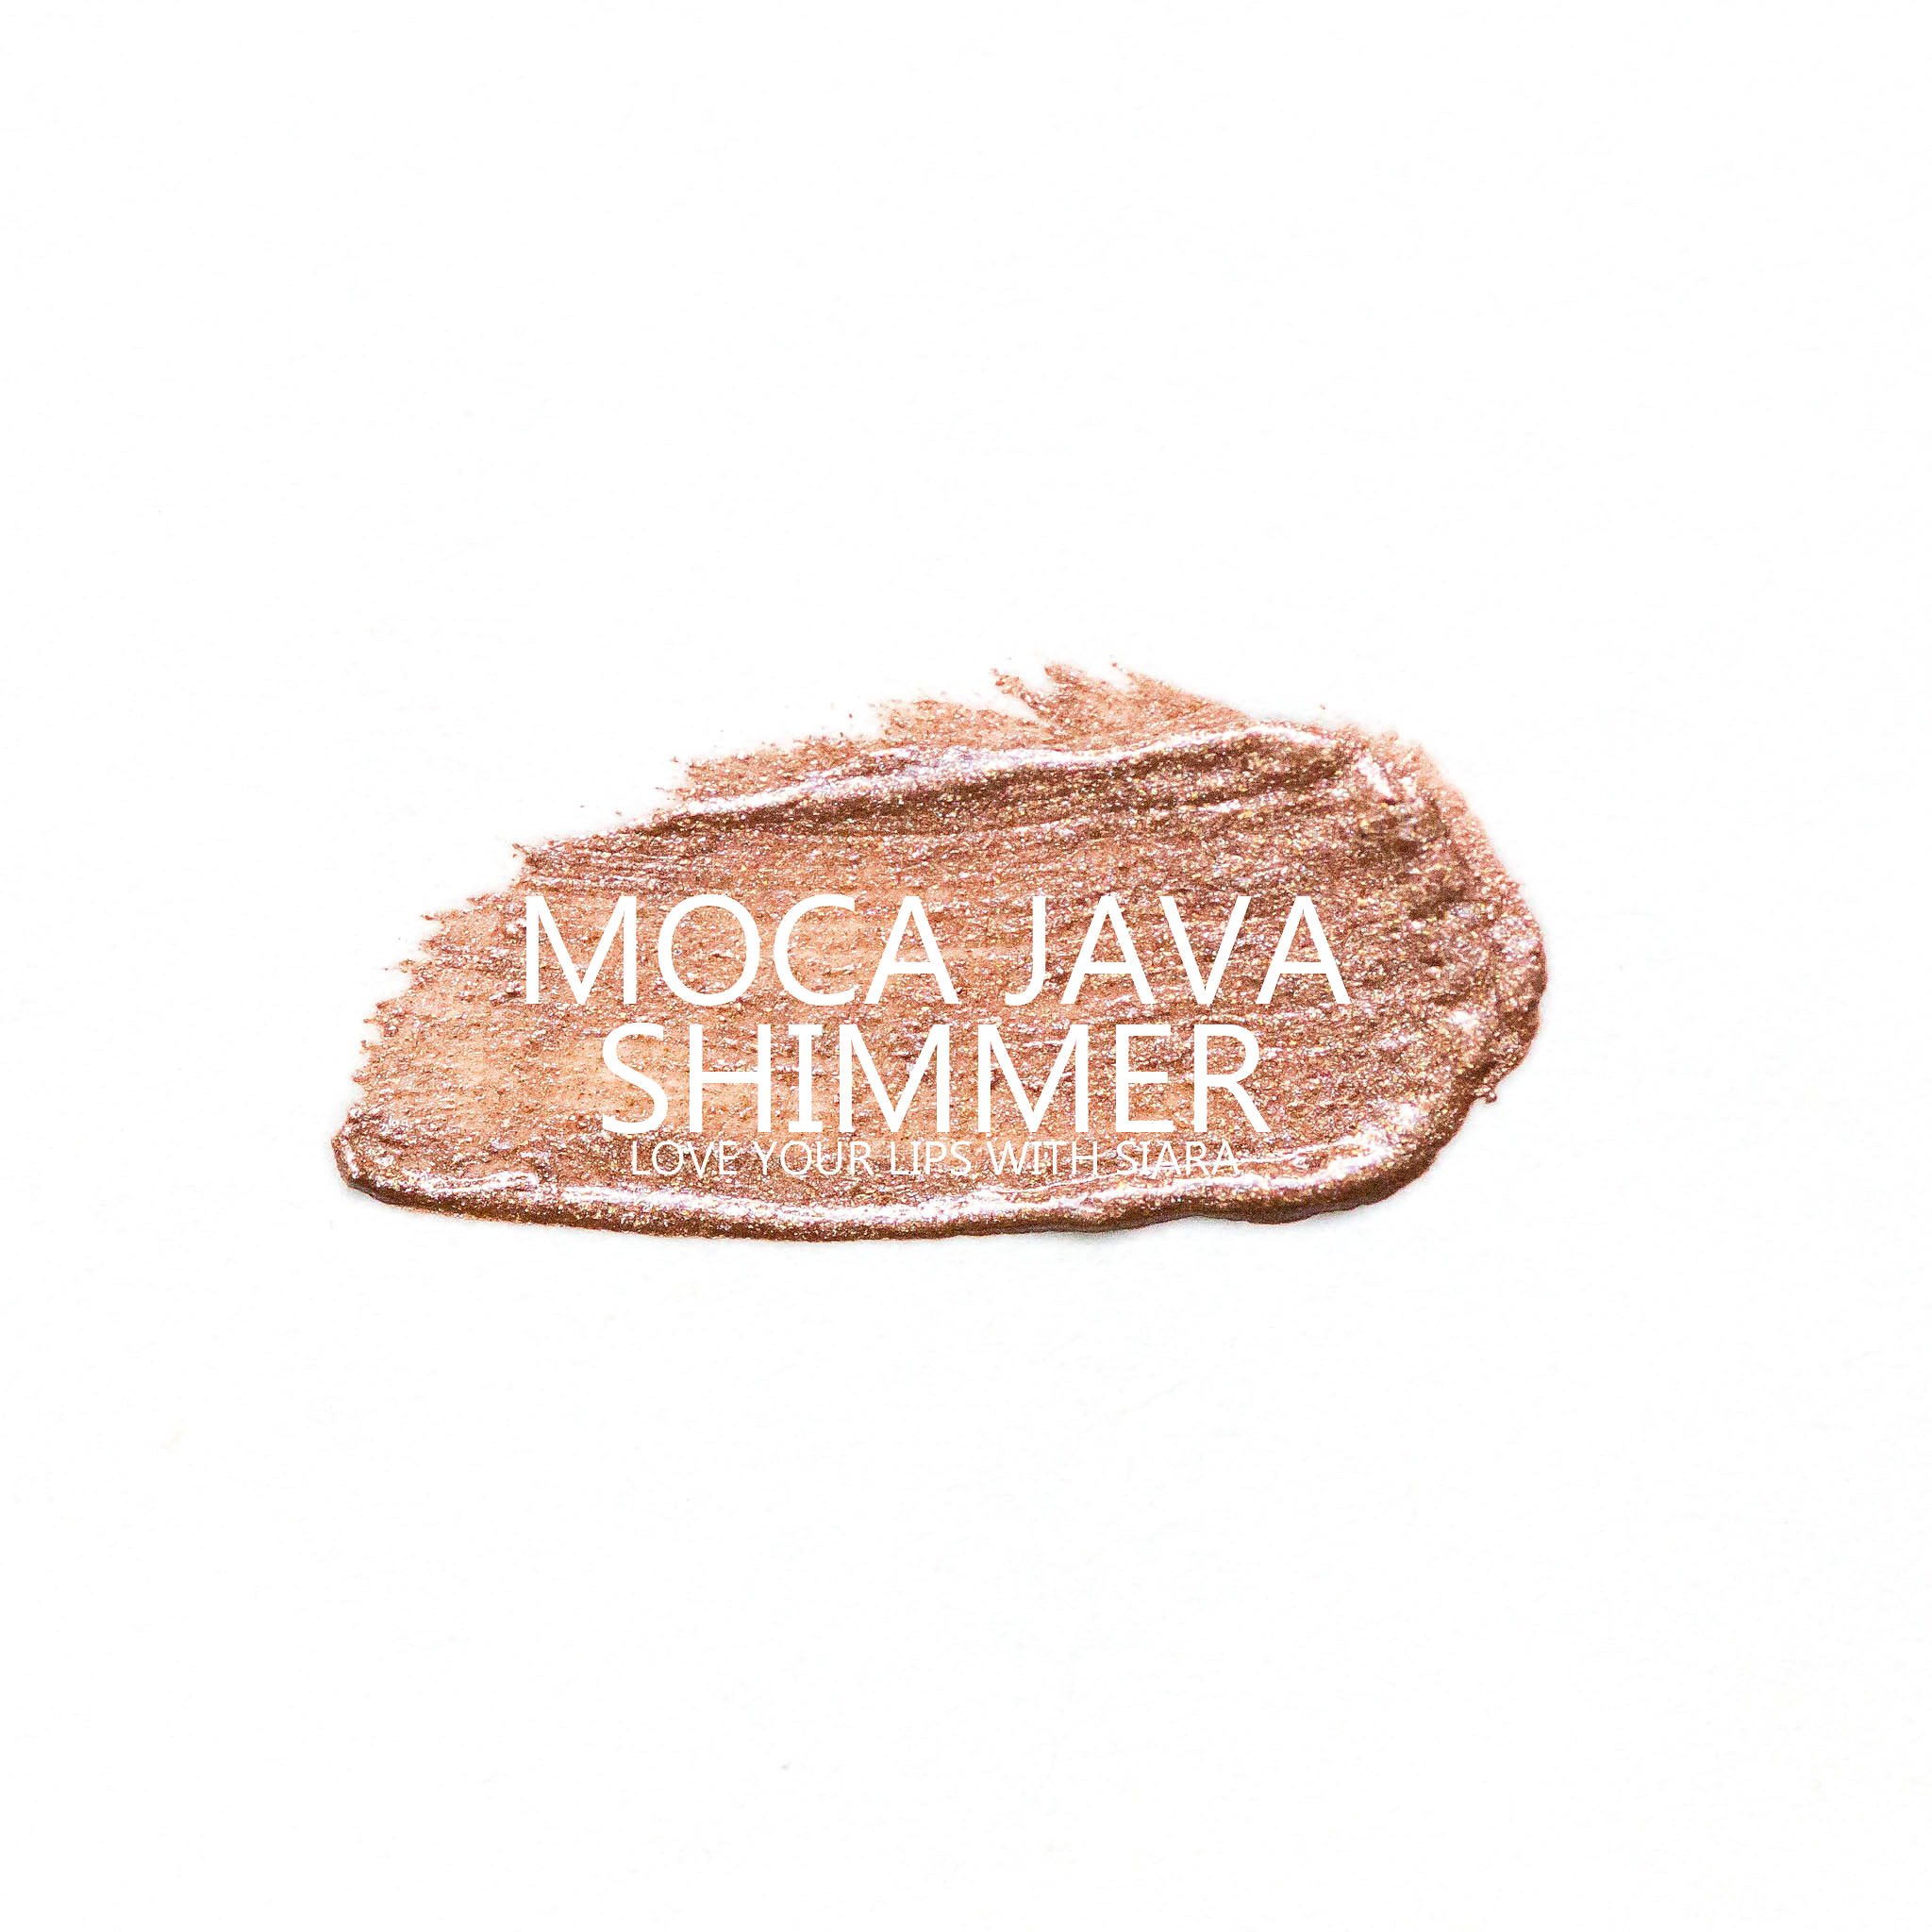 Moca Java Shimmer ShadowSense